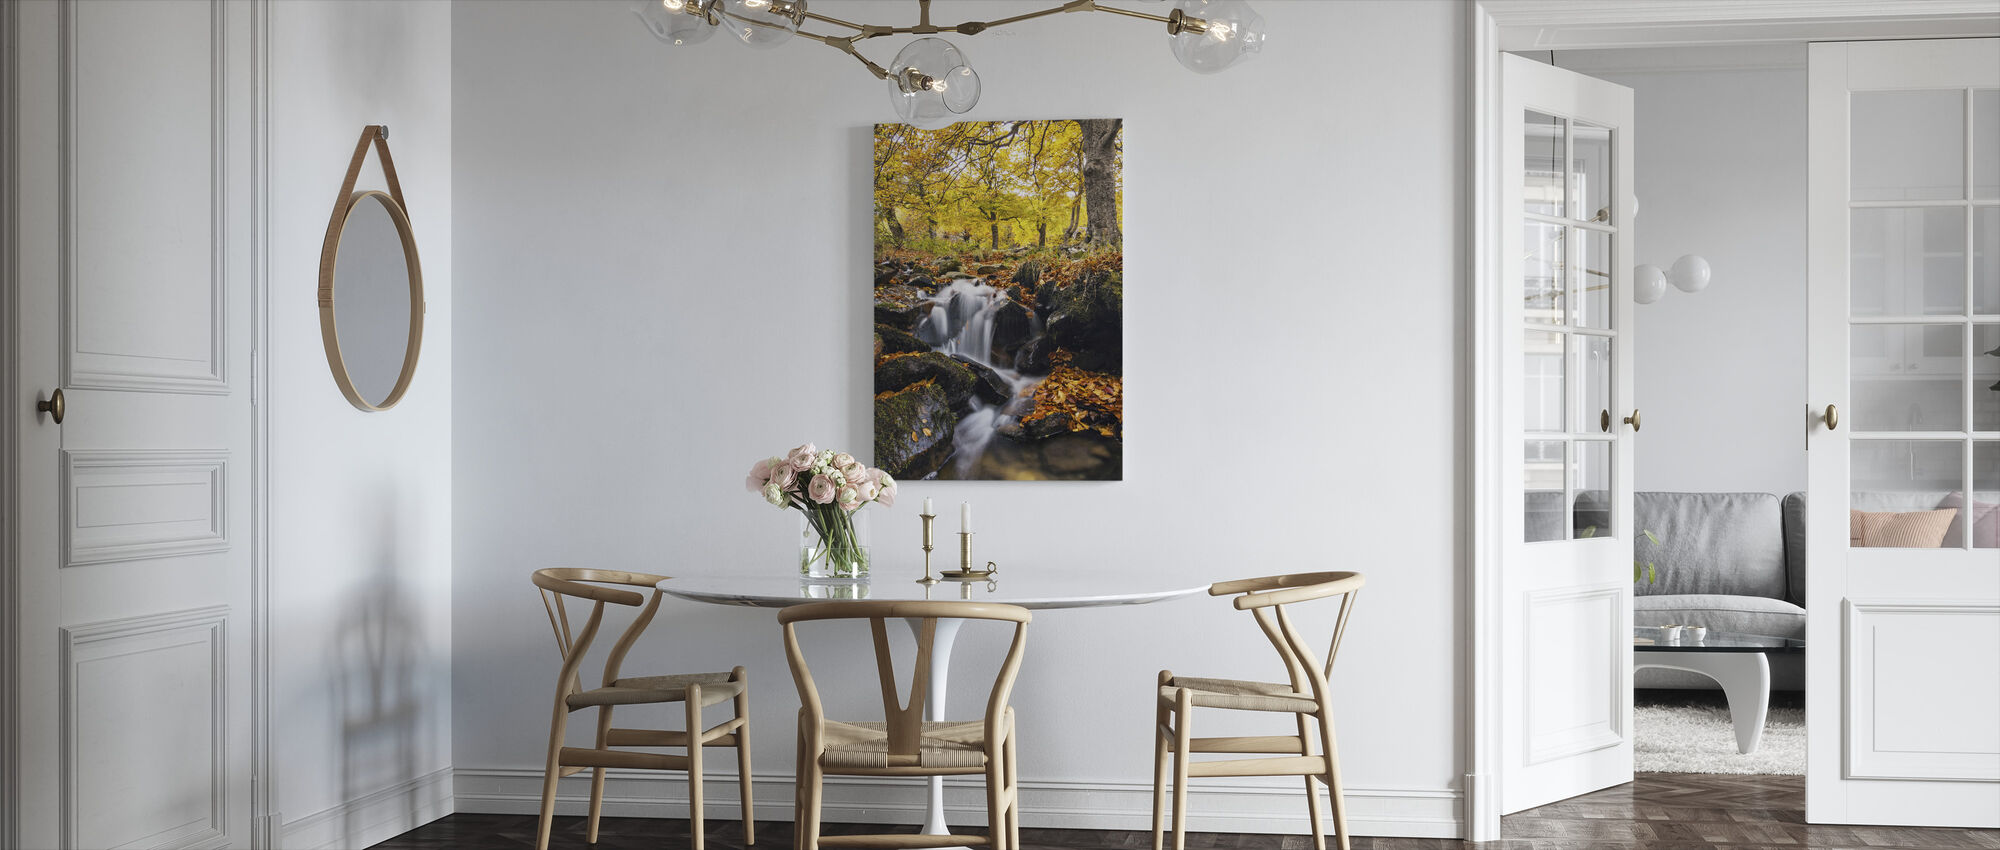 Splashes of Autumn - Canvas print - Kitchen